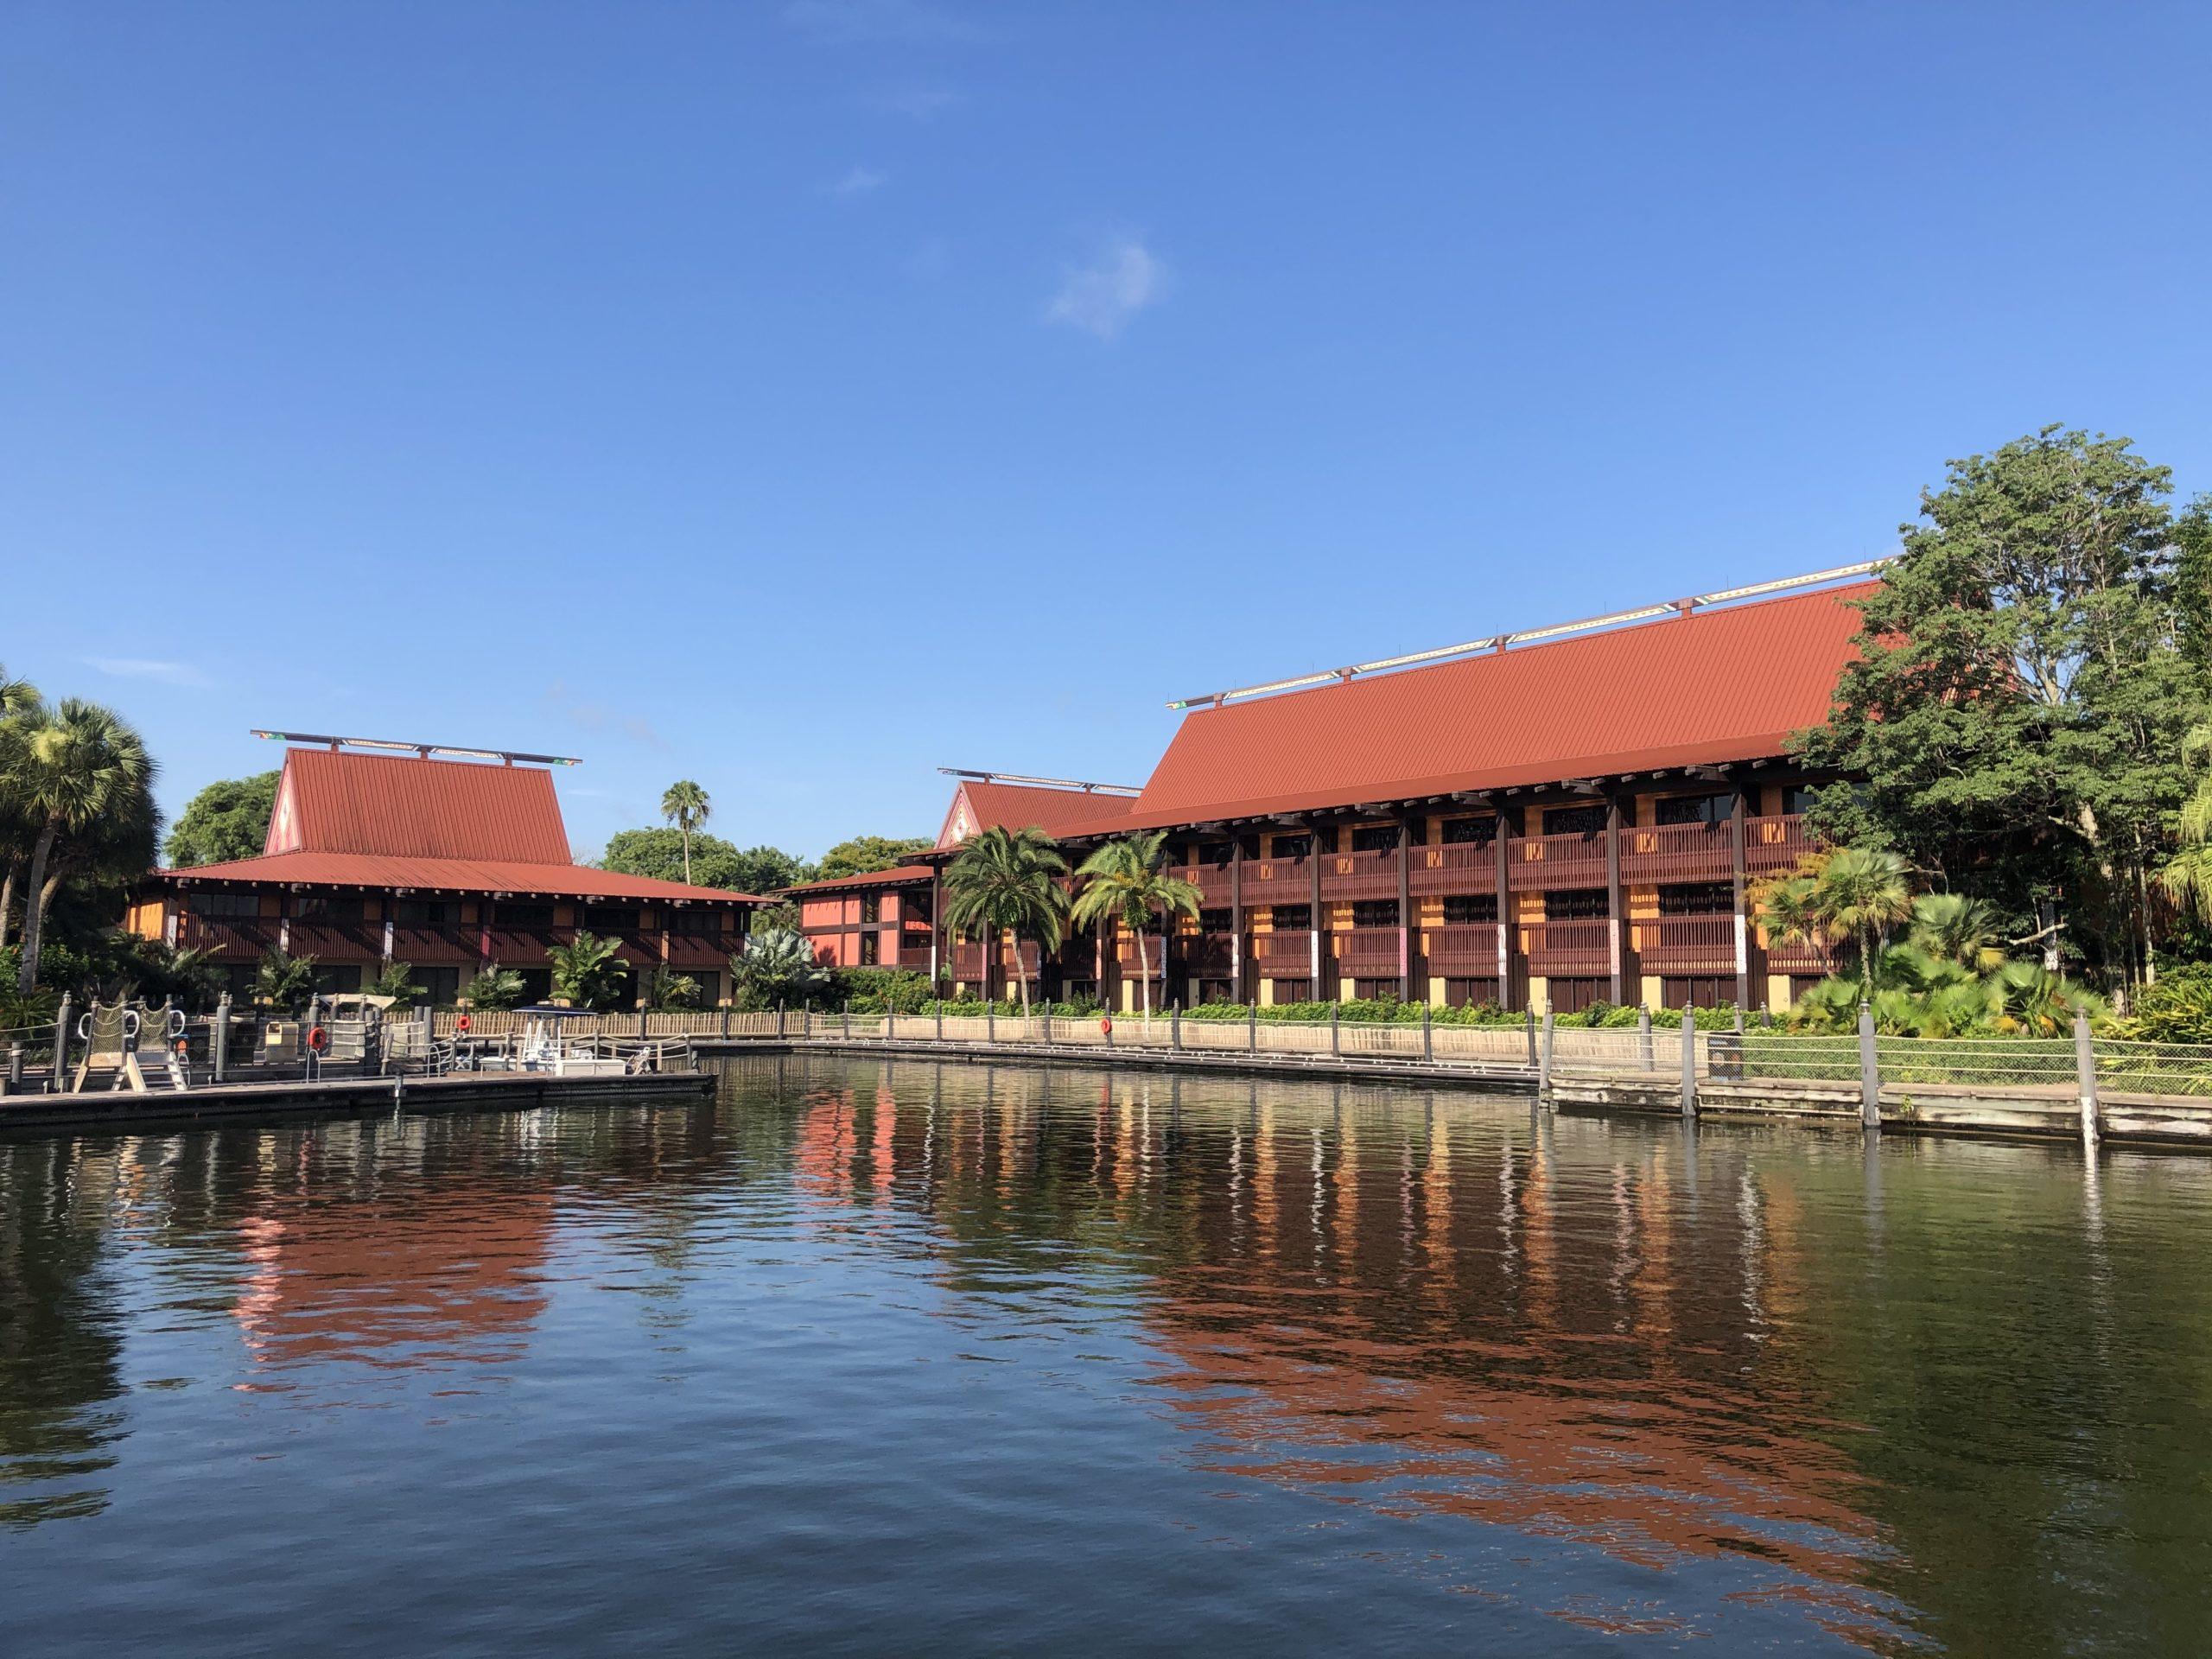 DVC's Polynesian Villas & Bungalows